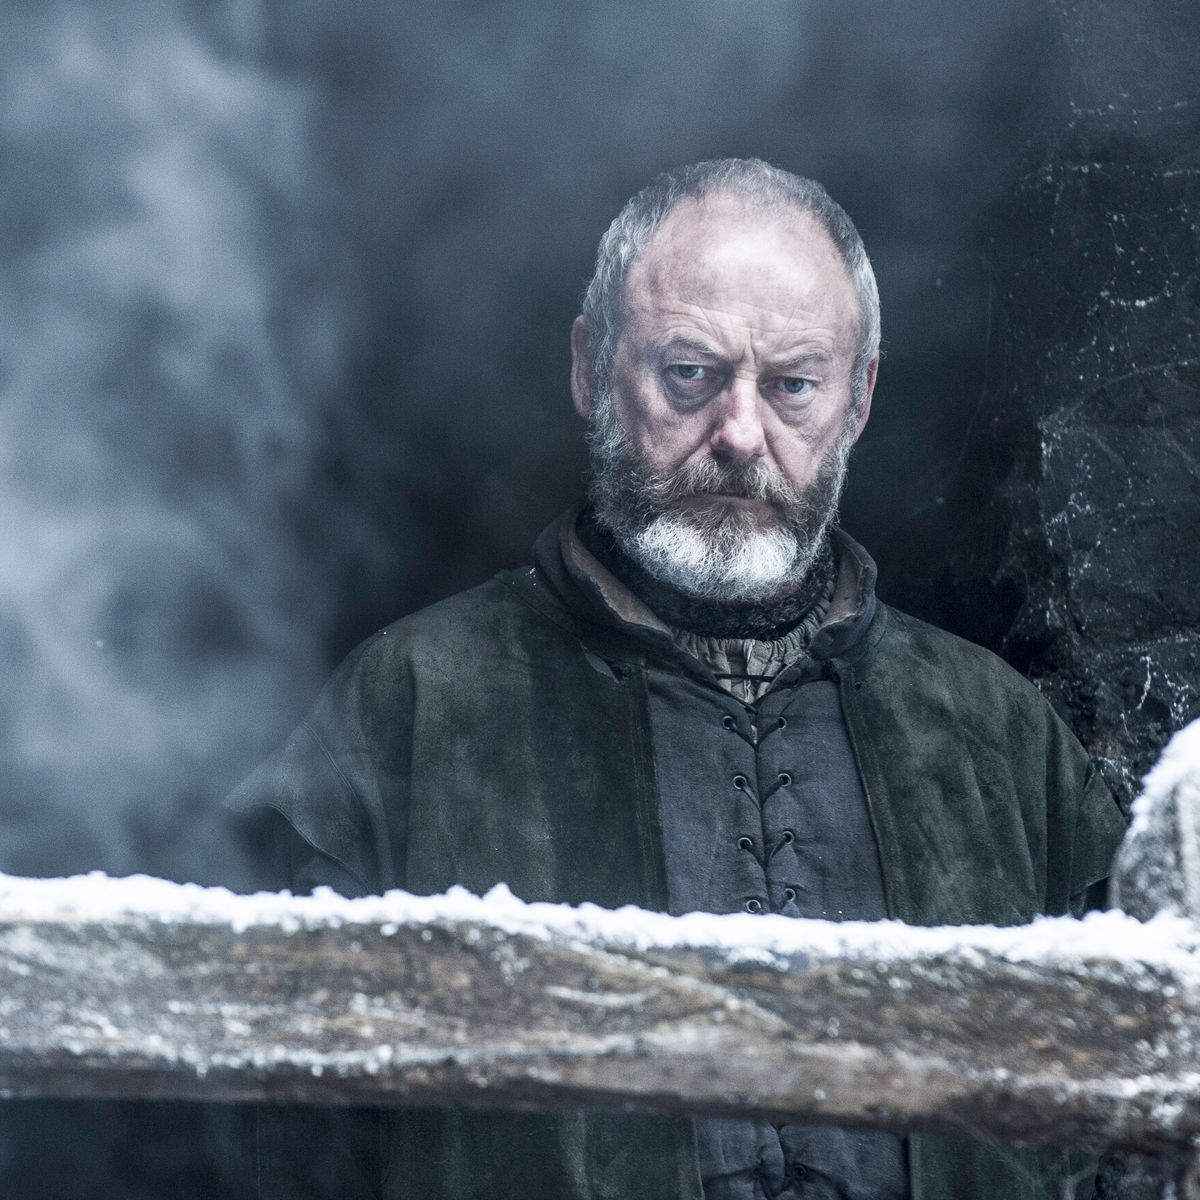 Davos_Seaworth_Game-of-Thrones_S6_Cunningham.jpg